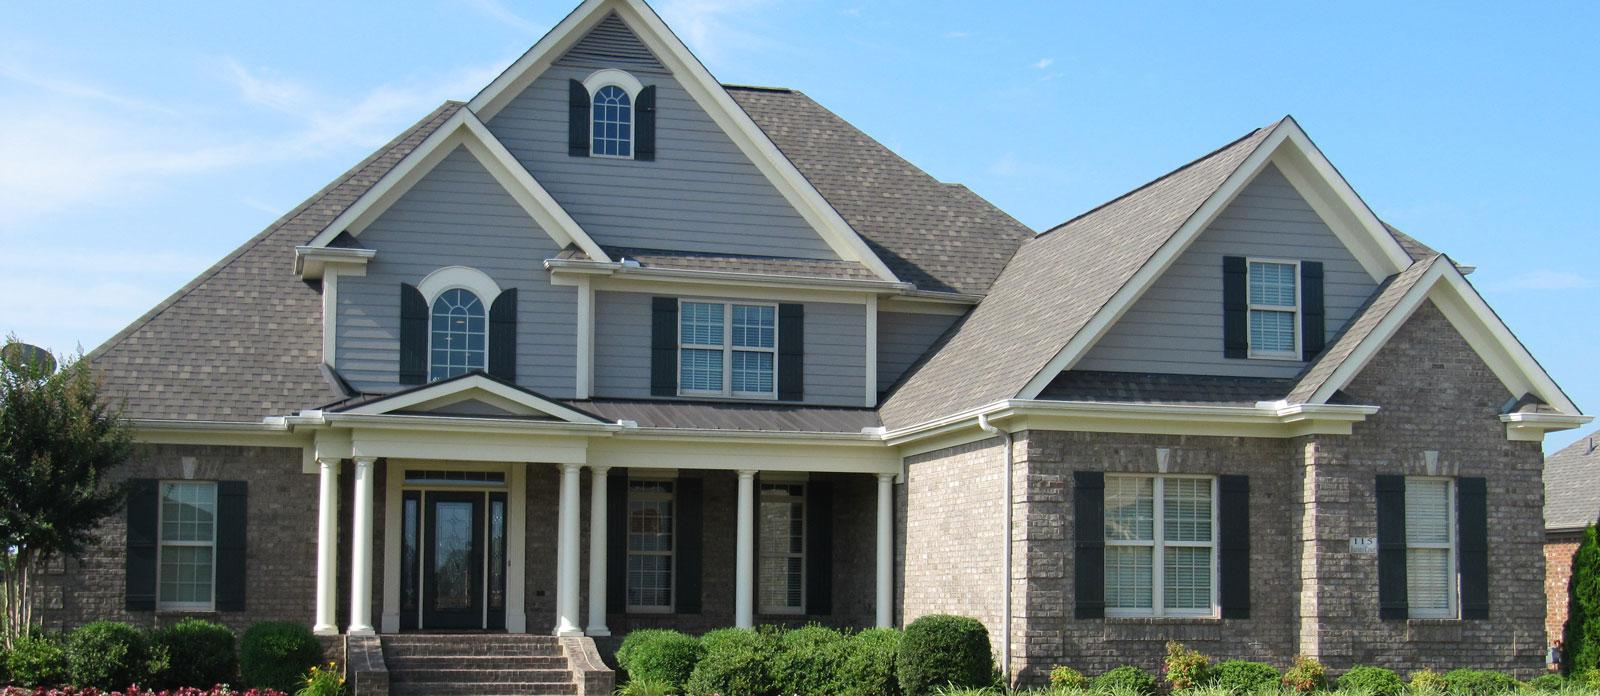 Bluestone custom home builder and custom home designs for North alabama home builders